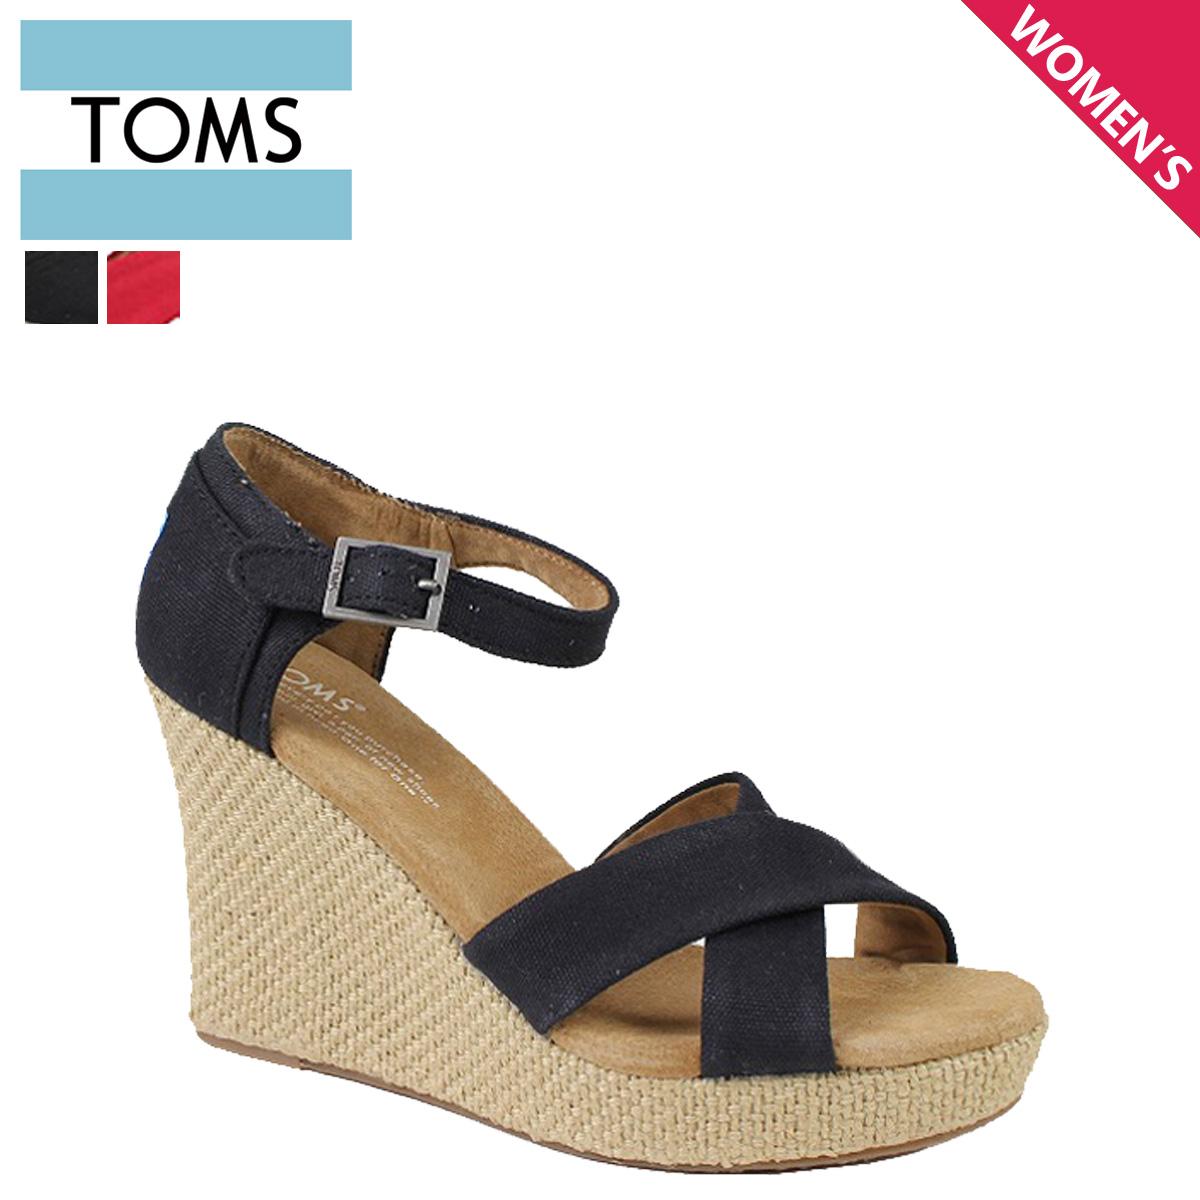 764f09ce2cc8 Thoms shoes TOMS SHOES Lady s sandals CANVAS WOMEN S STRAPPY WEDGES Tom s Thoms  shoes